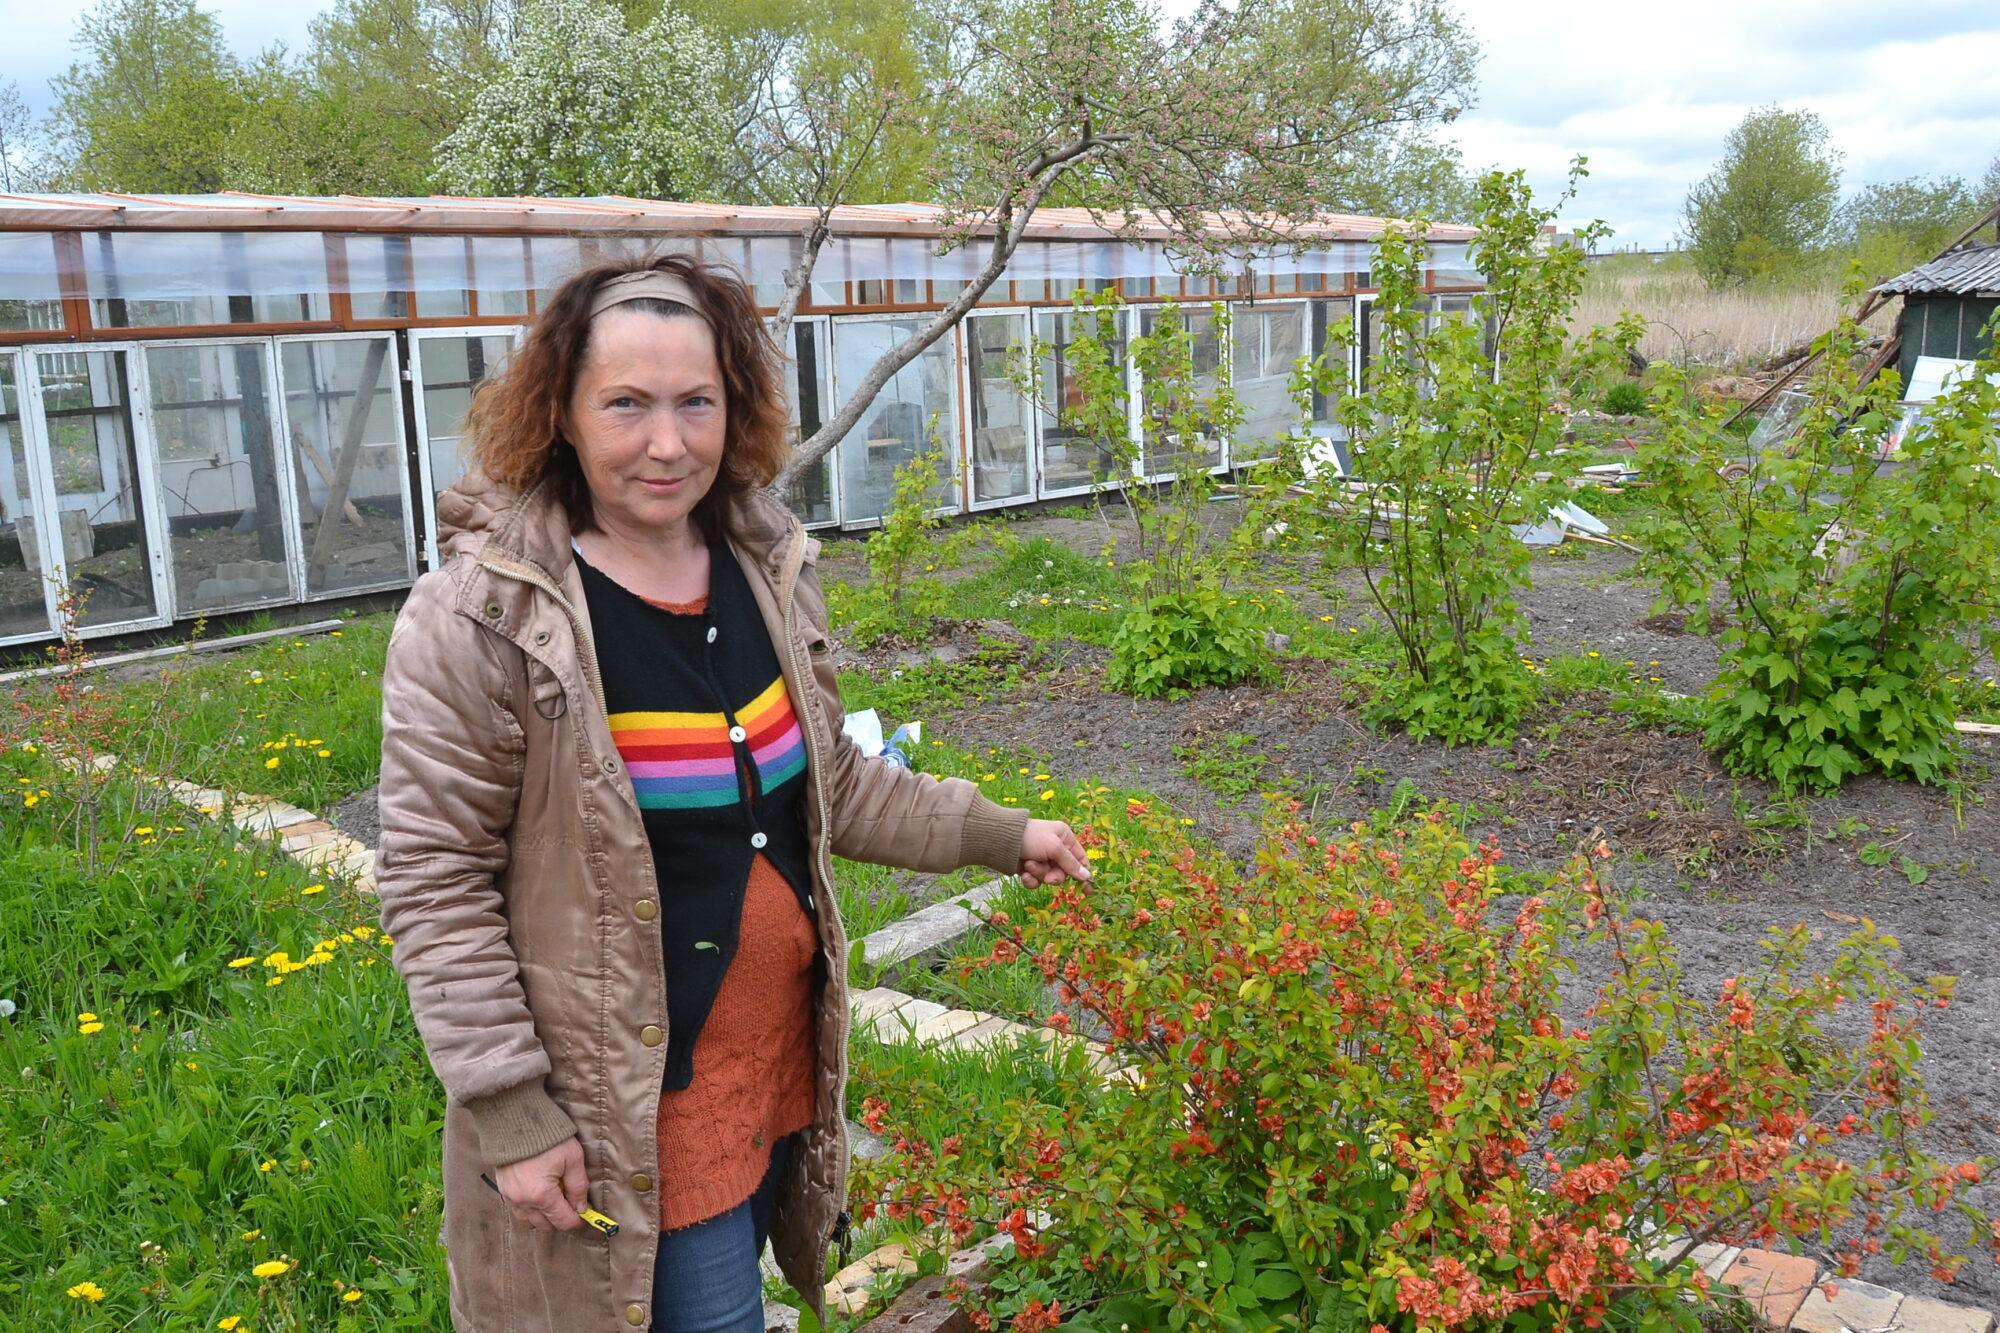 Laimes un rūpju zeme – dārziņš